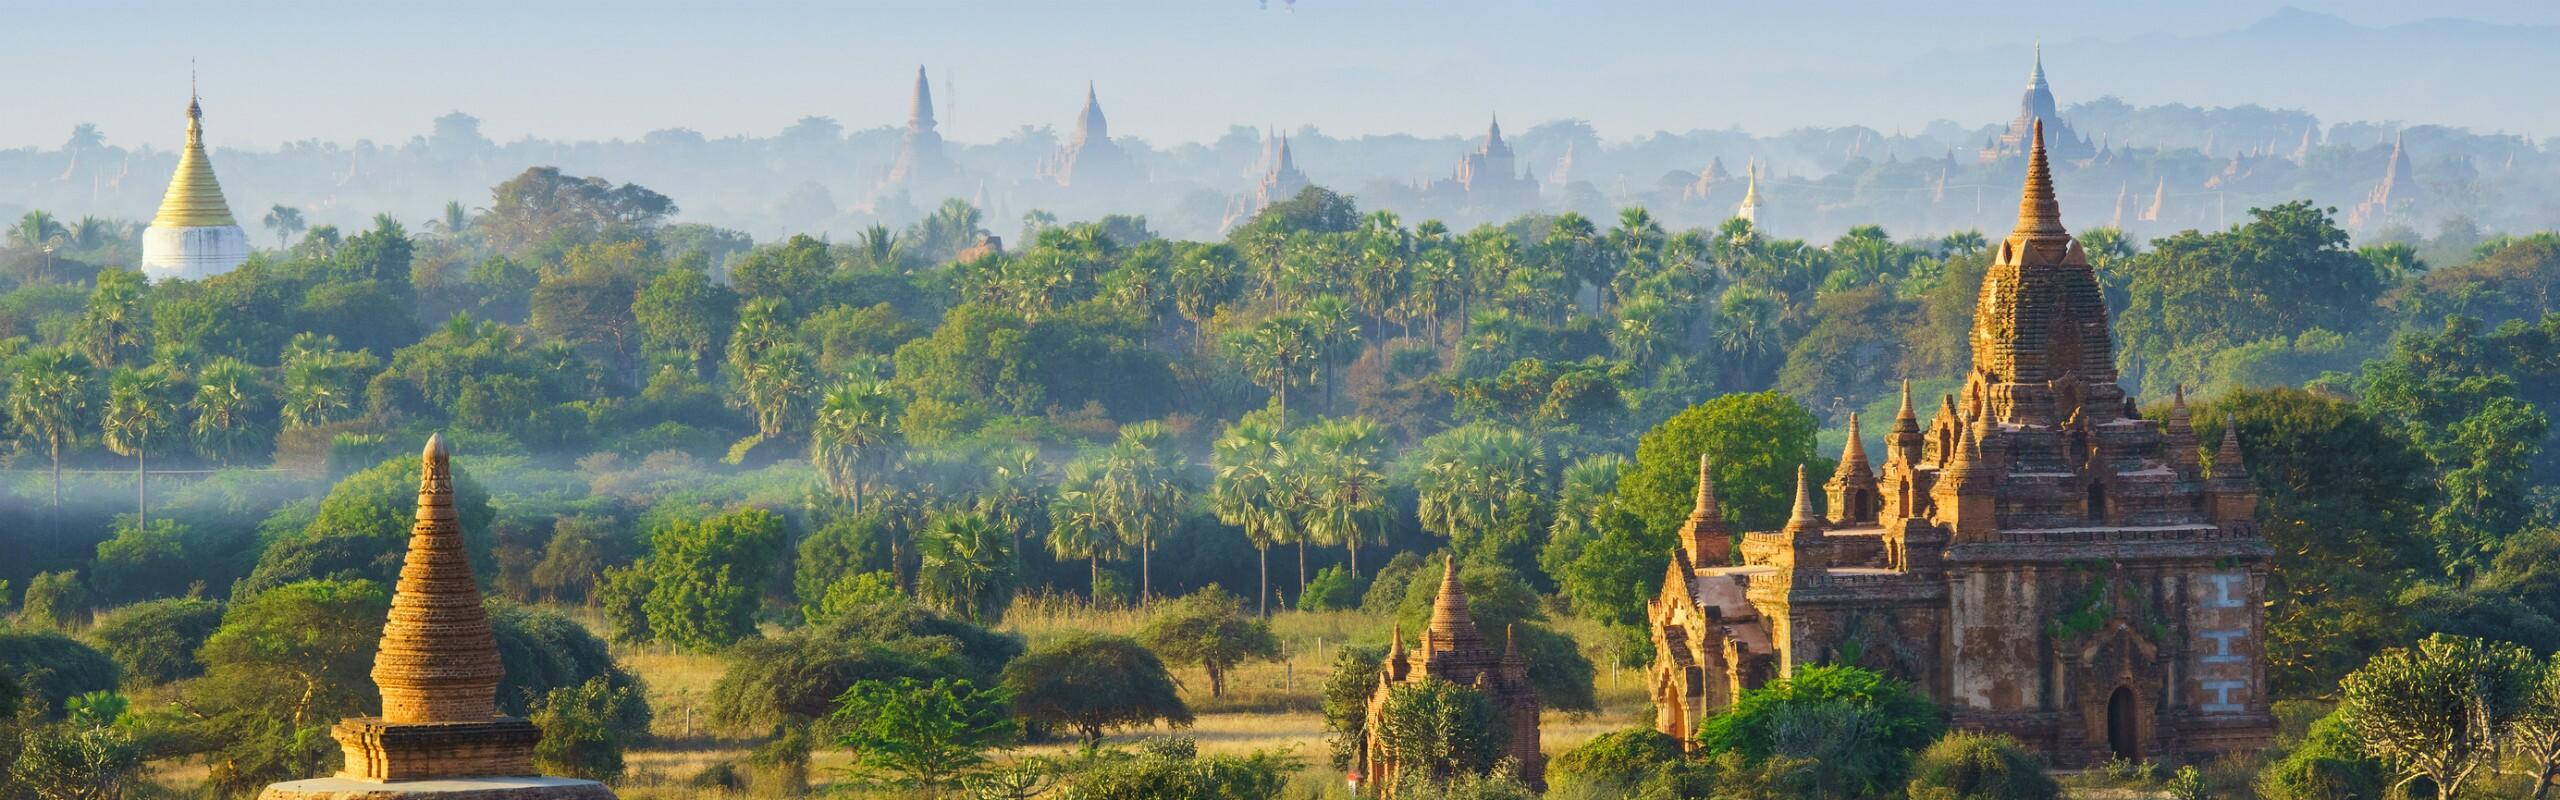 Myanmar Temples and Pagodas - The Land of Pagodas